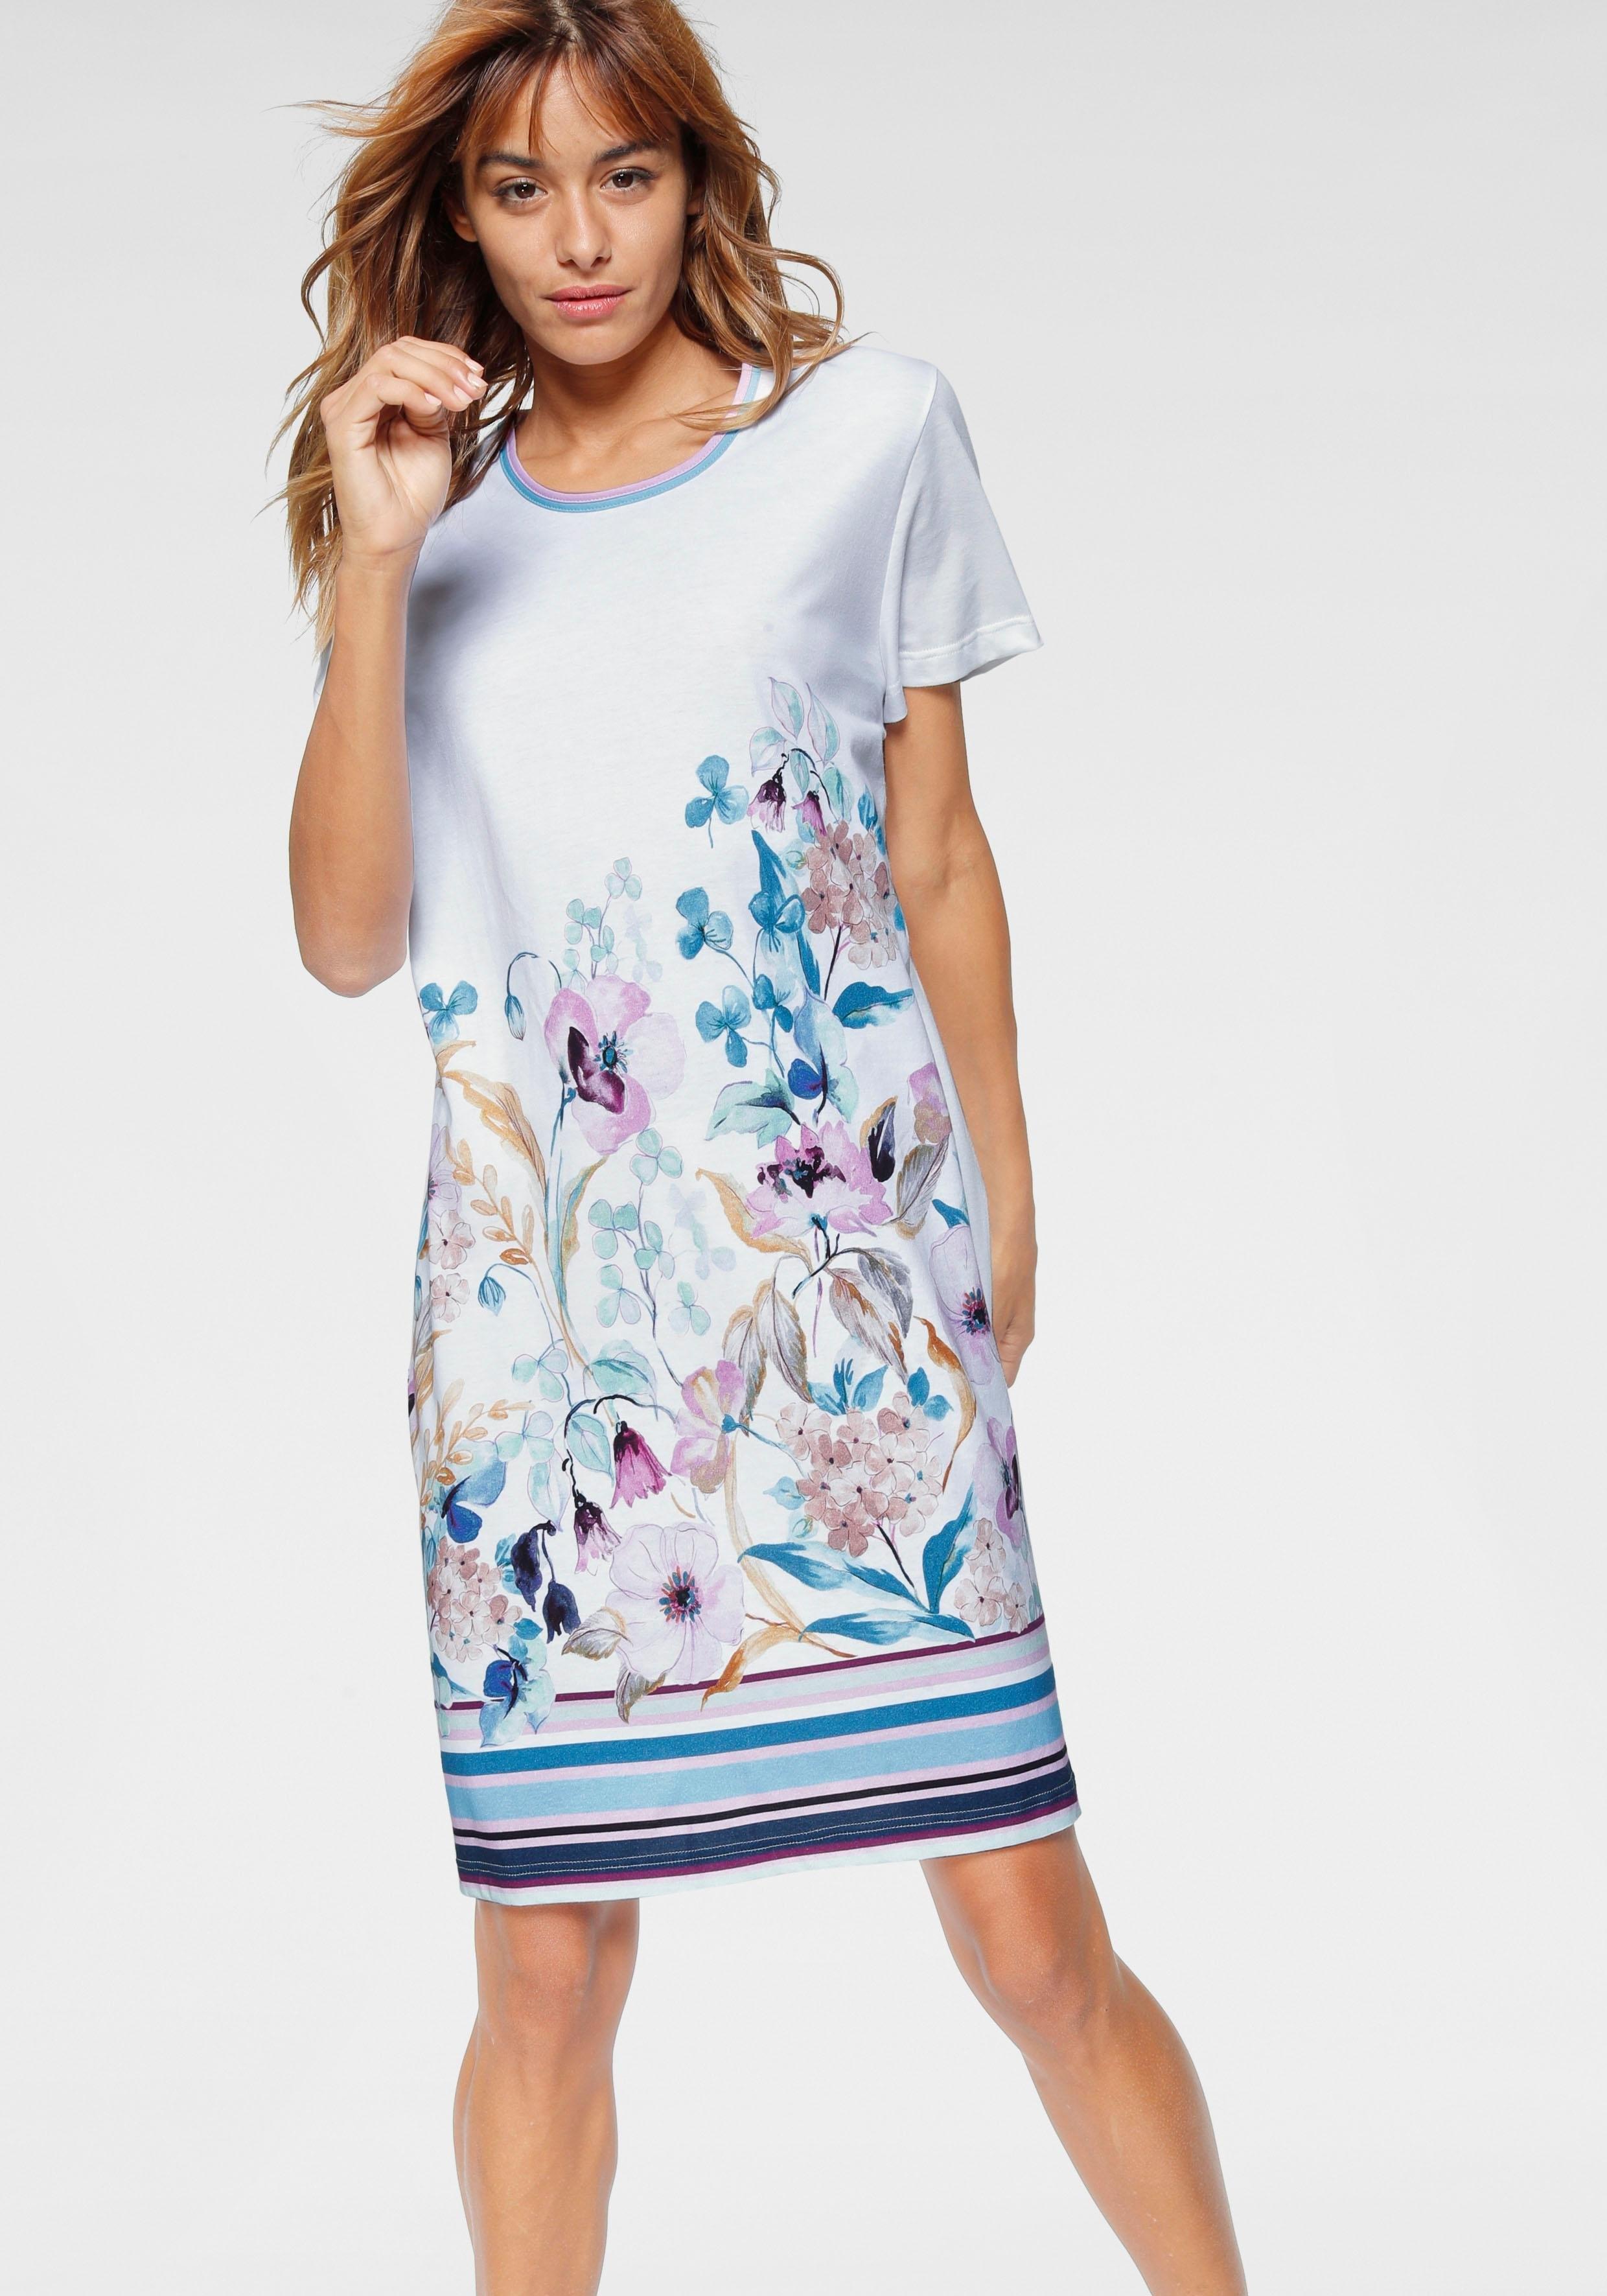 Cybèle nachthemd nu online kopen bij Lascana